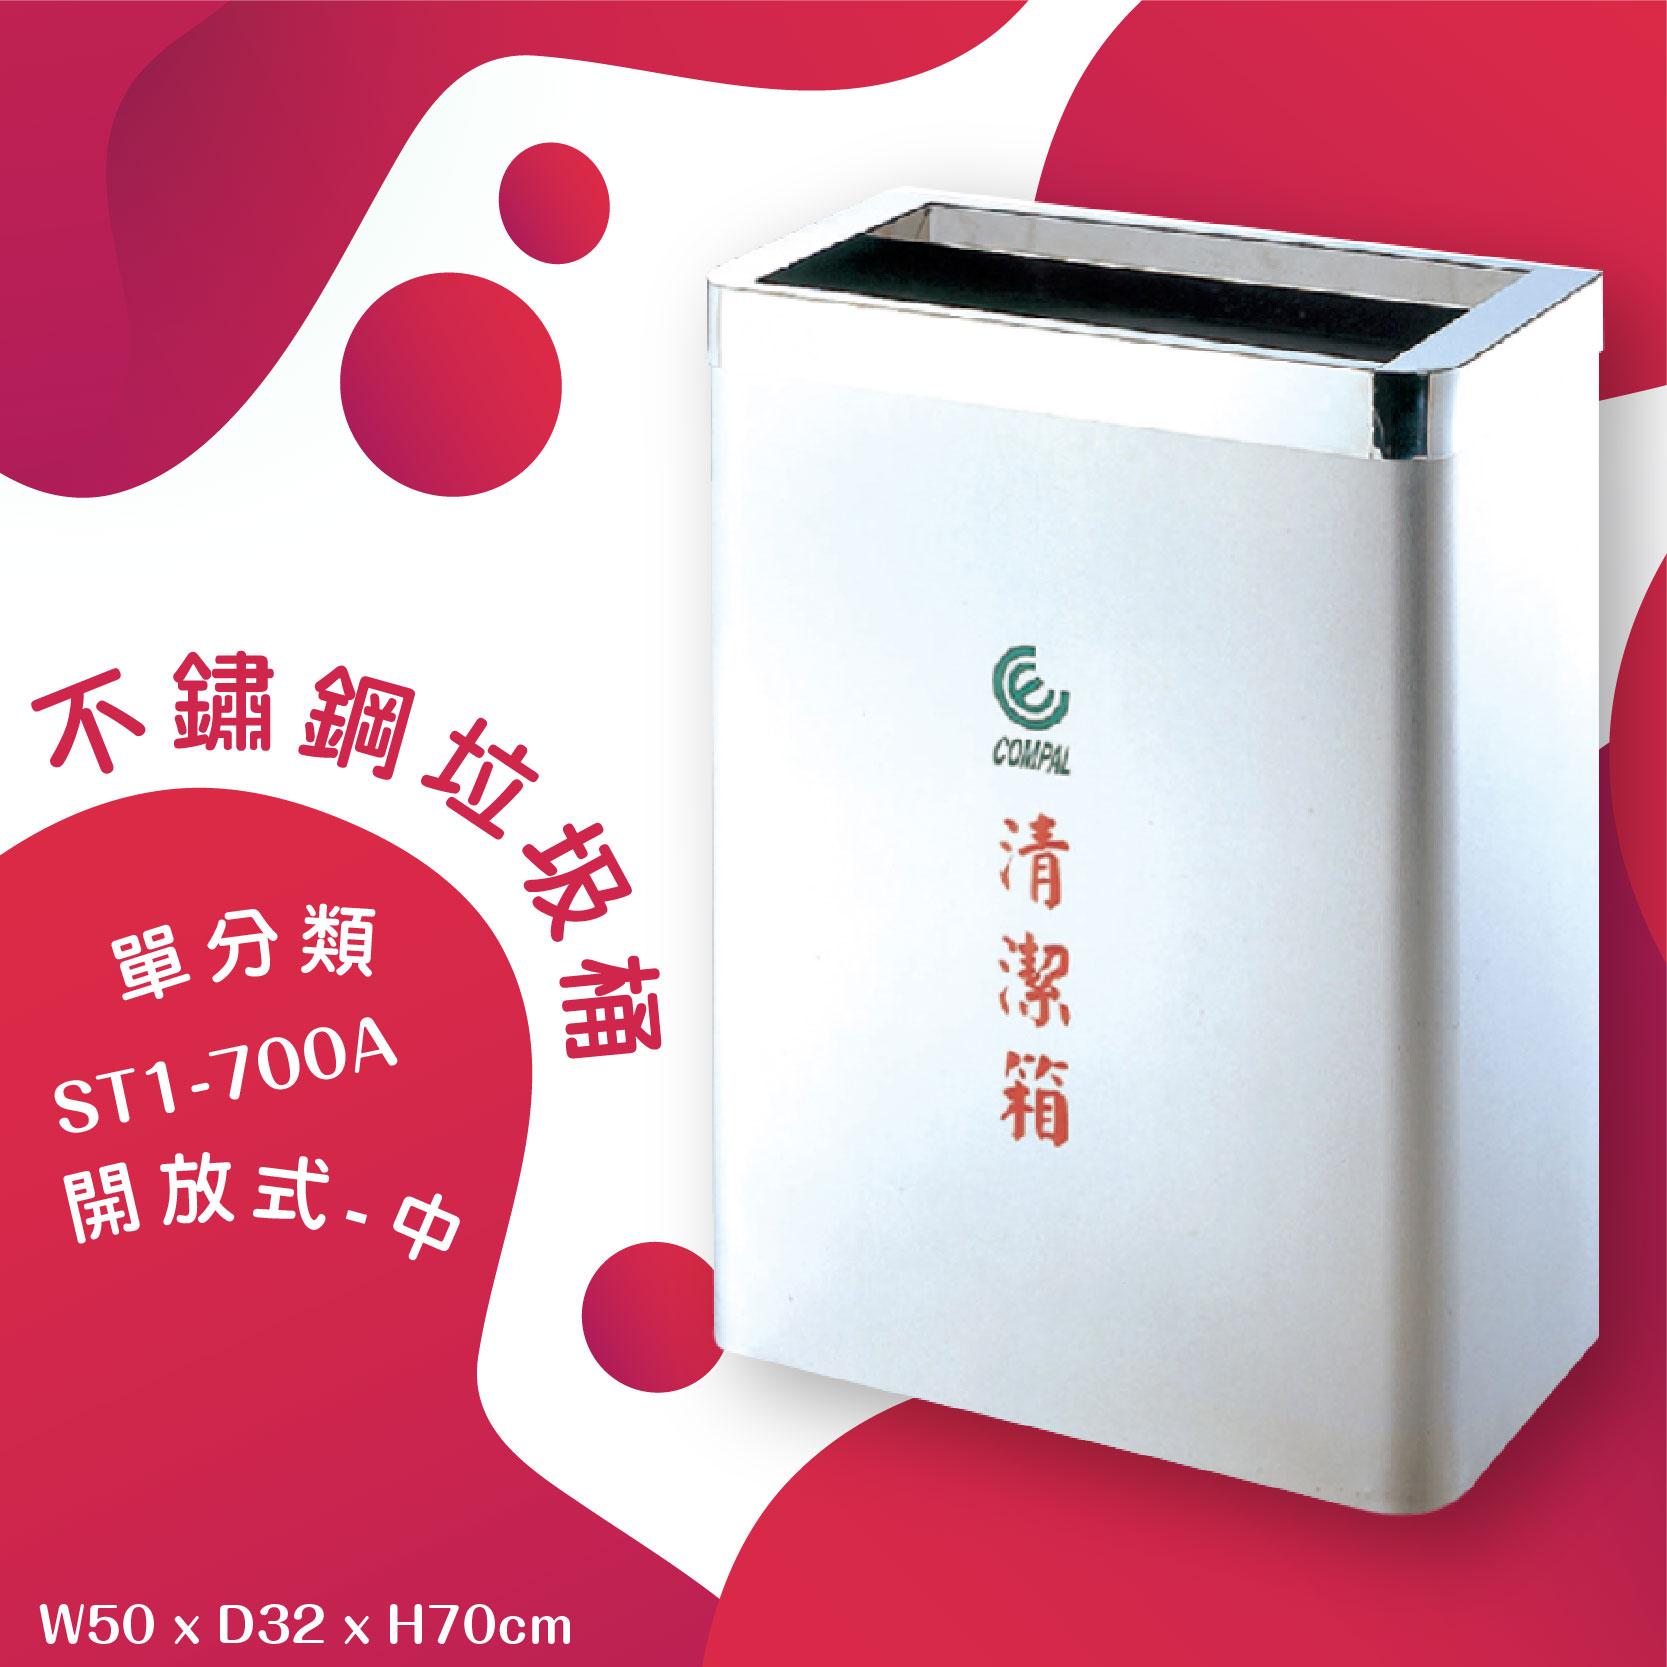 ST1-700A 不鏽鋼清潔箱(中) 開放式 垃圾桶 不鏽鋼垃圾桶 回收桶 環境清潔 資源回收 公共設施